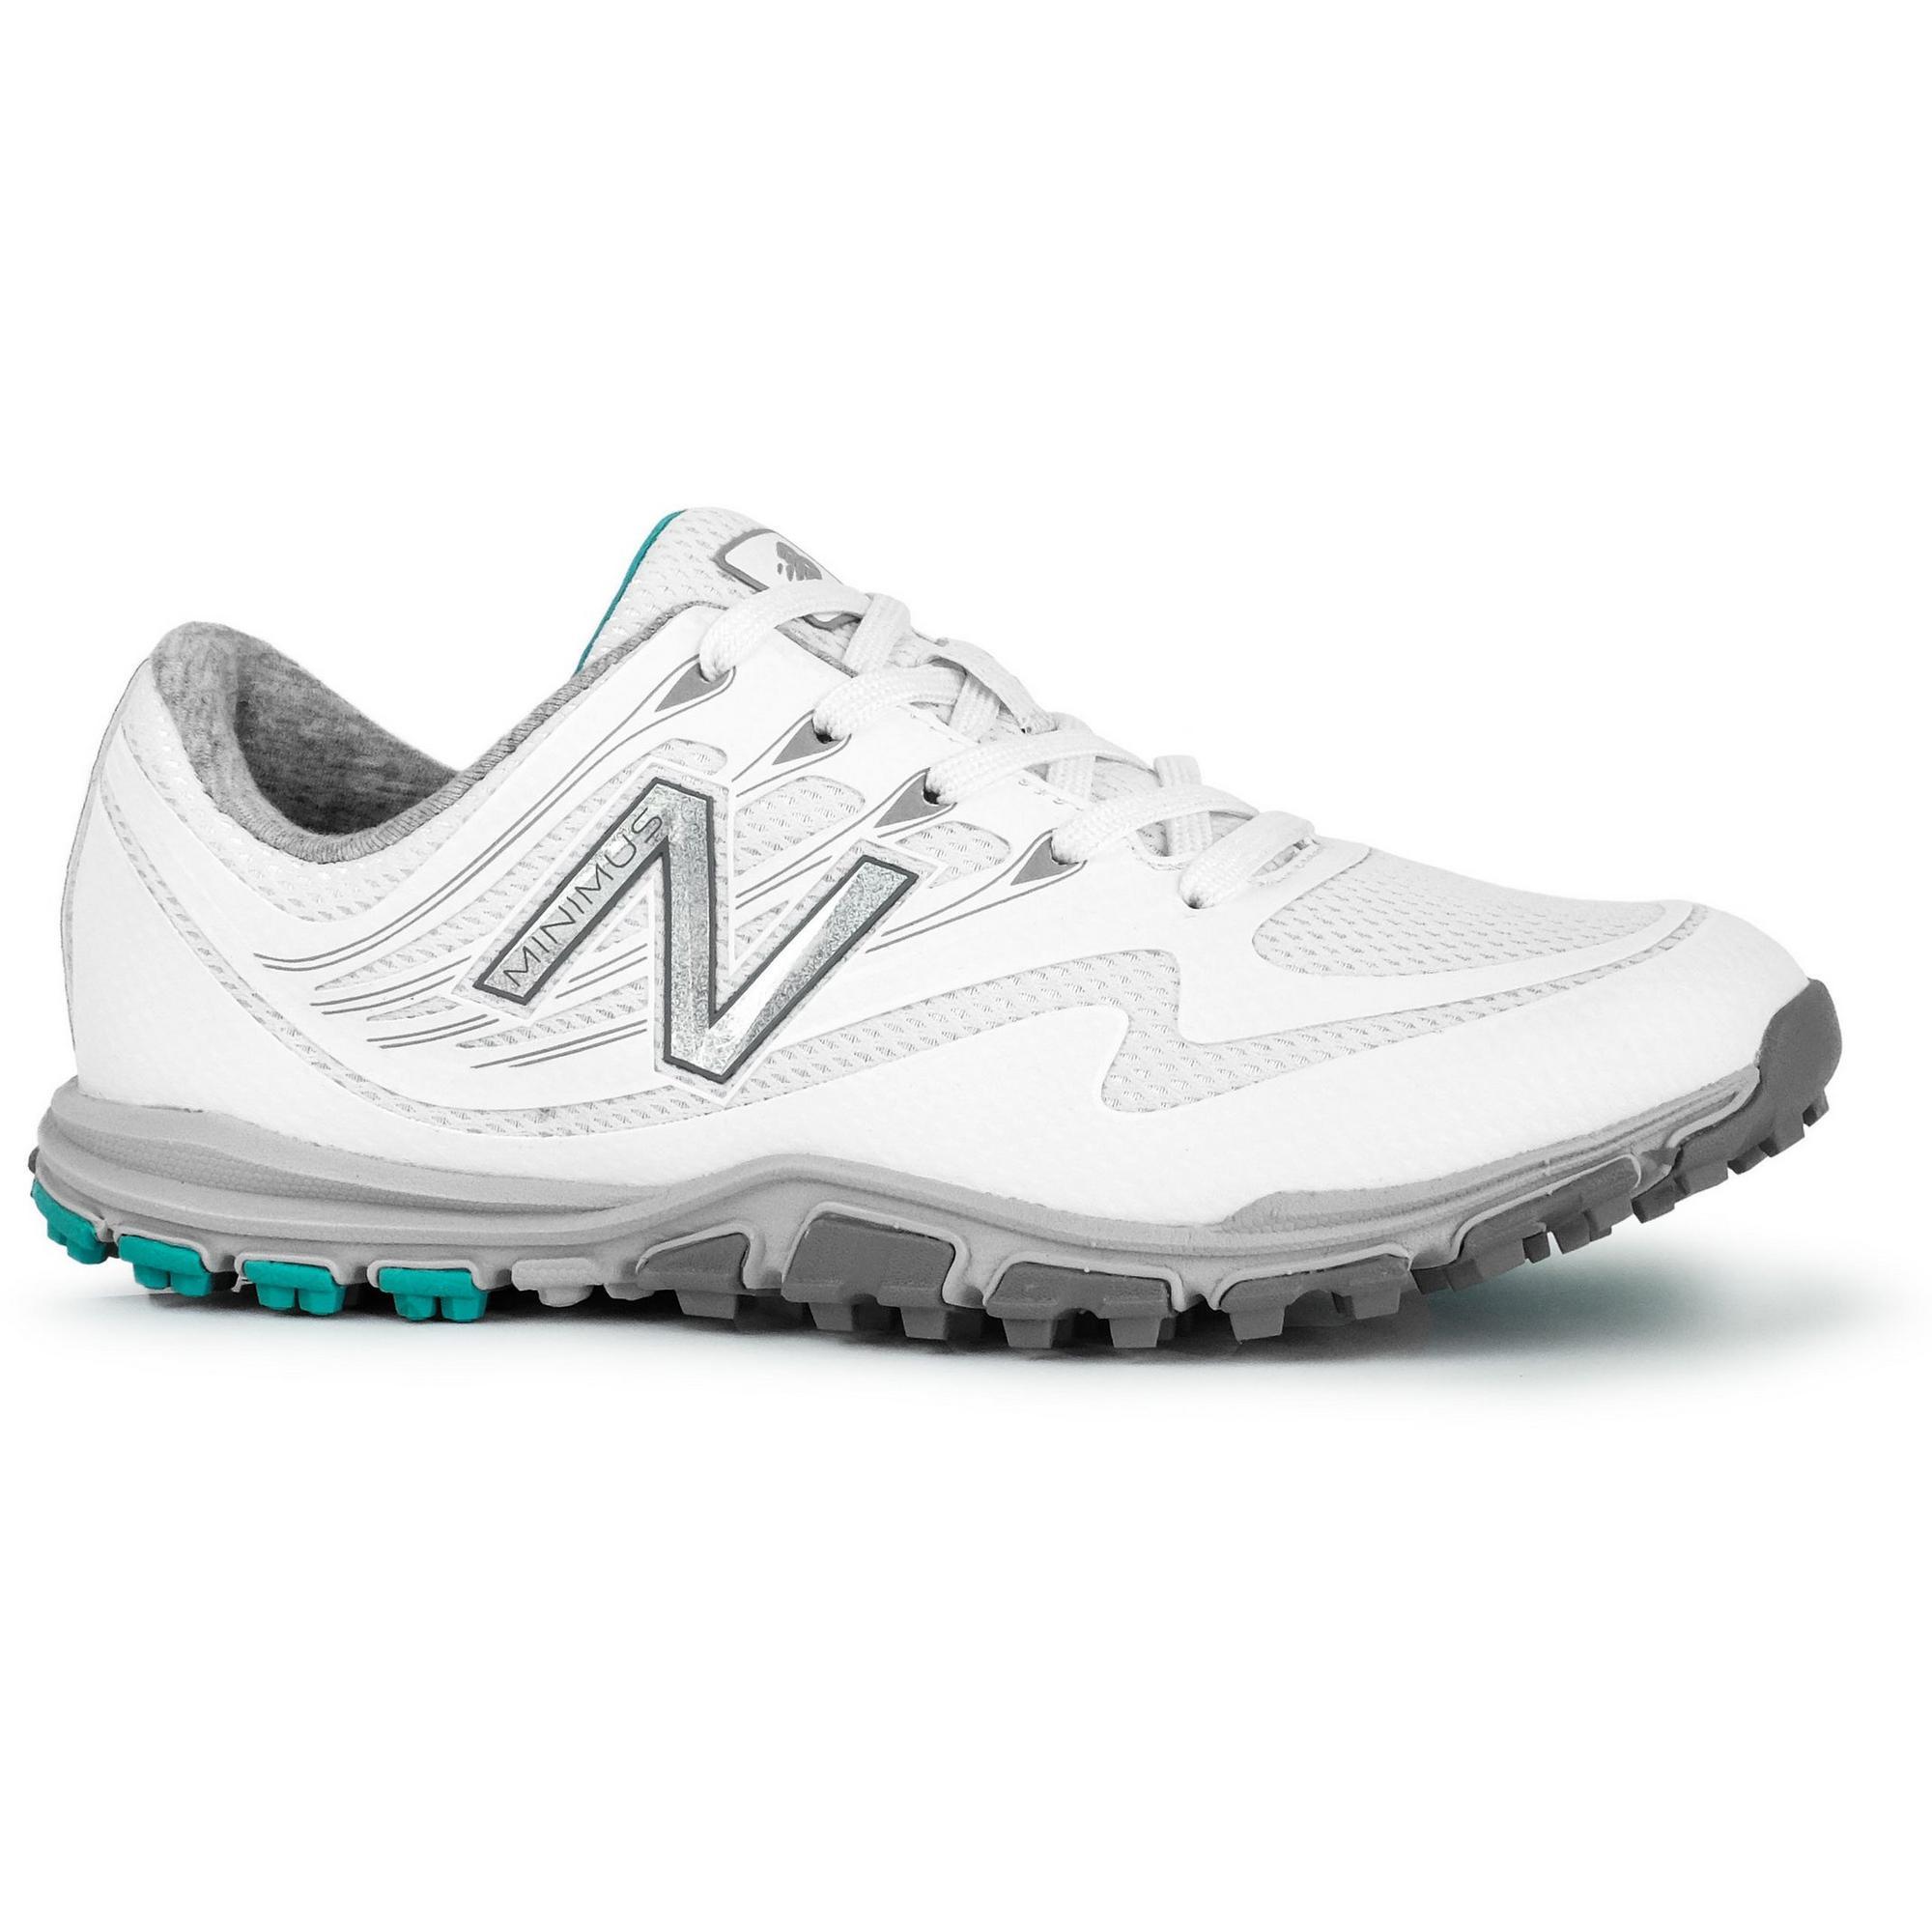 Women's Minimus Sport Spikeless Golf Shoe - White